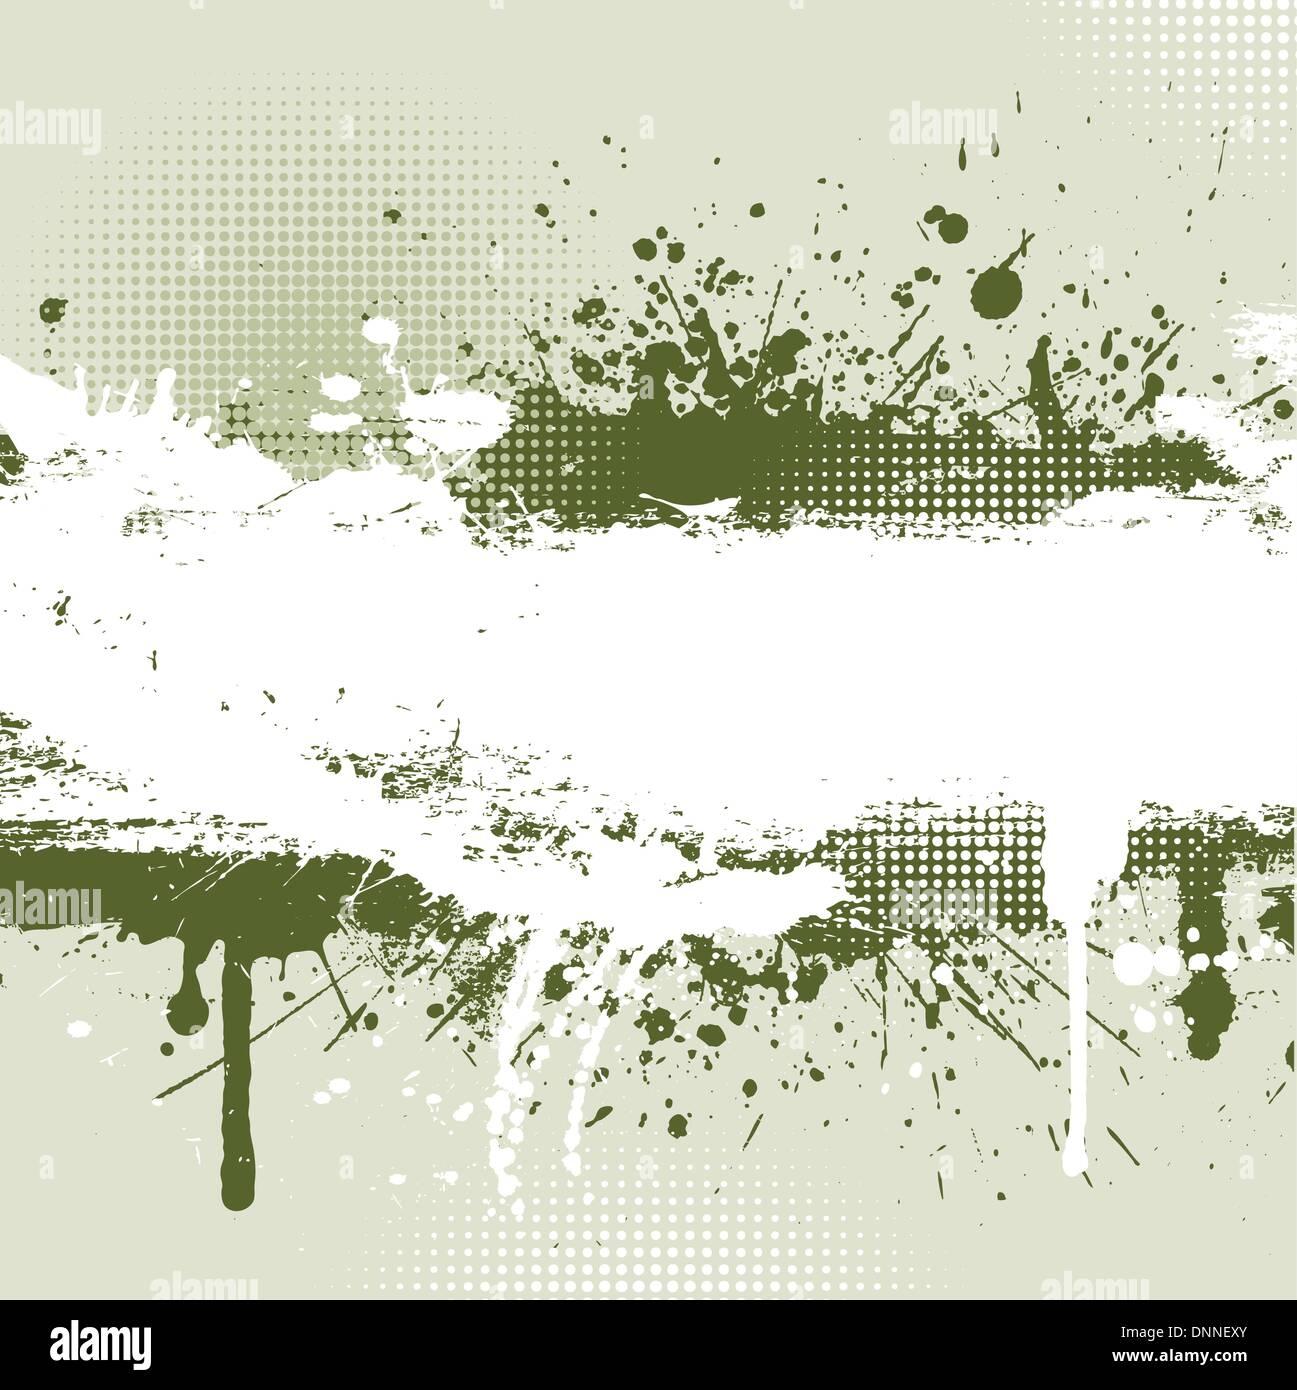 Detallada con antecedentes grunge splats y gotea Imagen De Stock